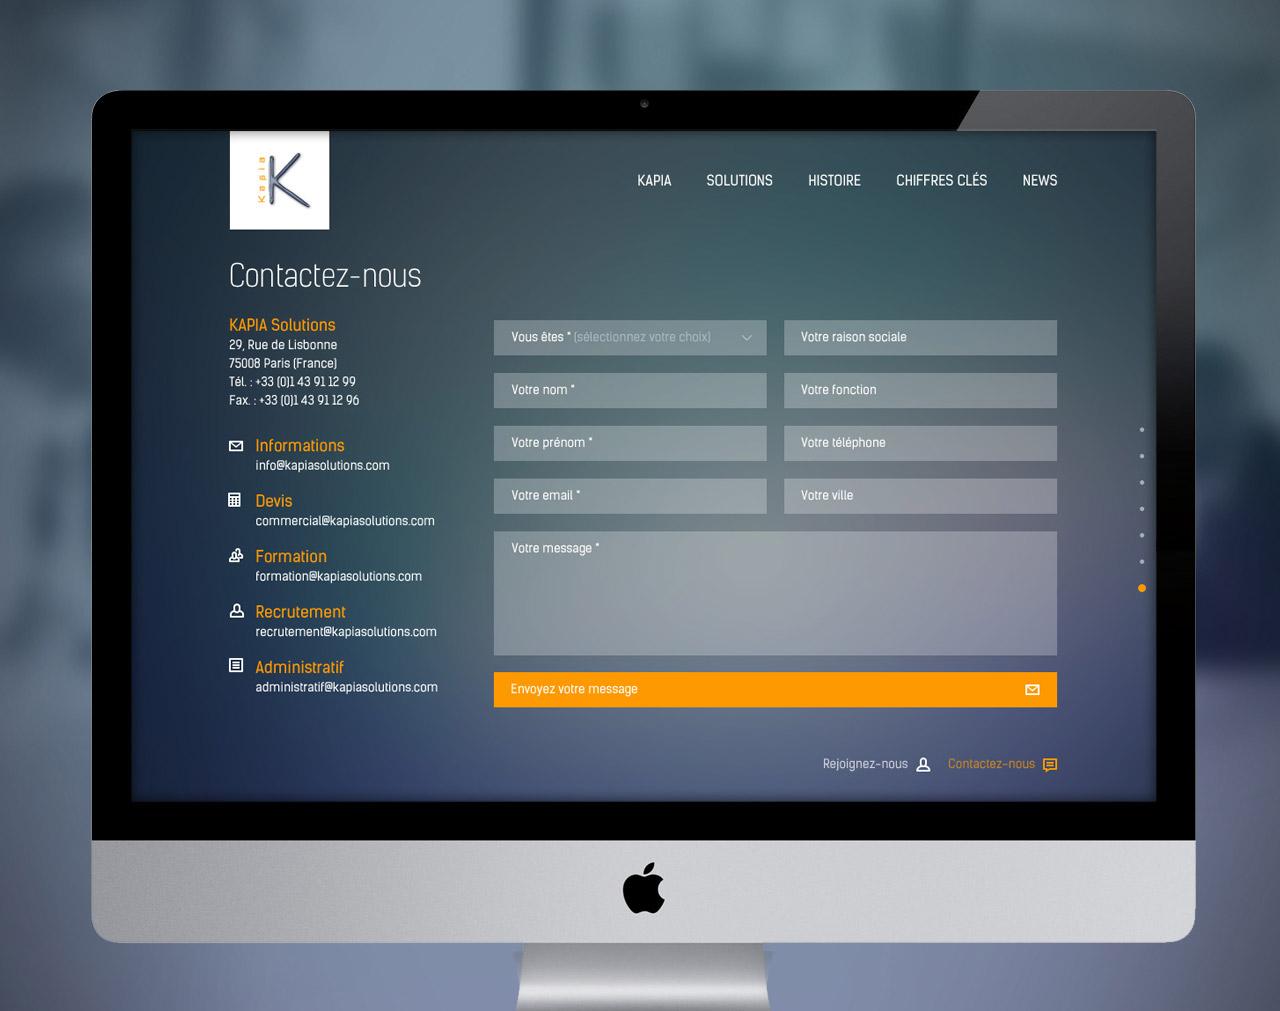 kapia-solutions-contact-site-internet-responsive-design-creation-communication-caconcept-alexis-cretin-graphiste